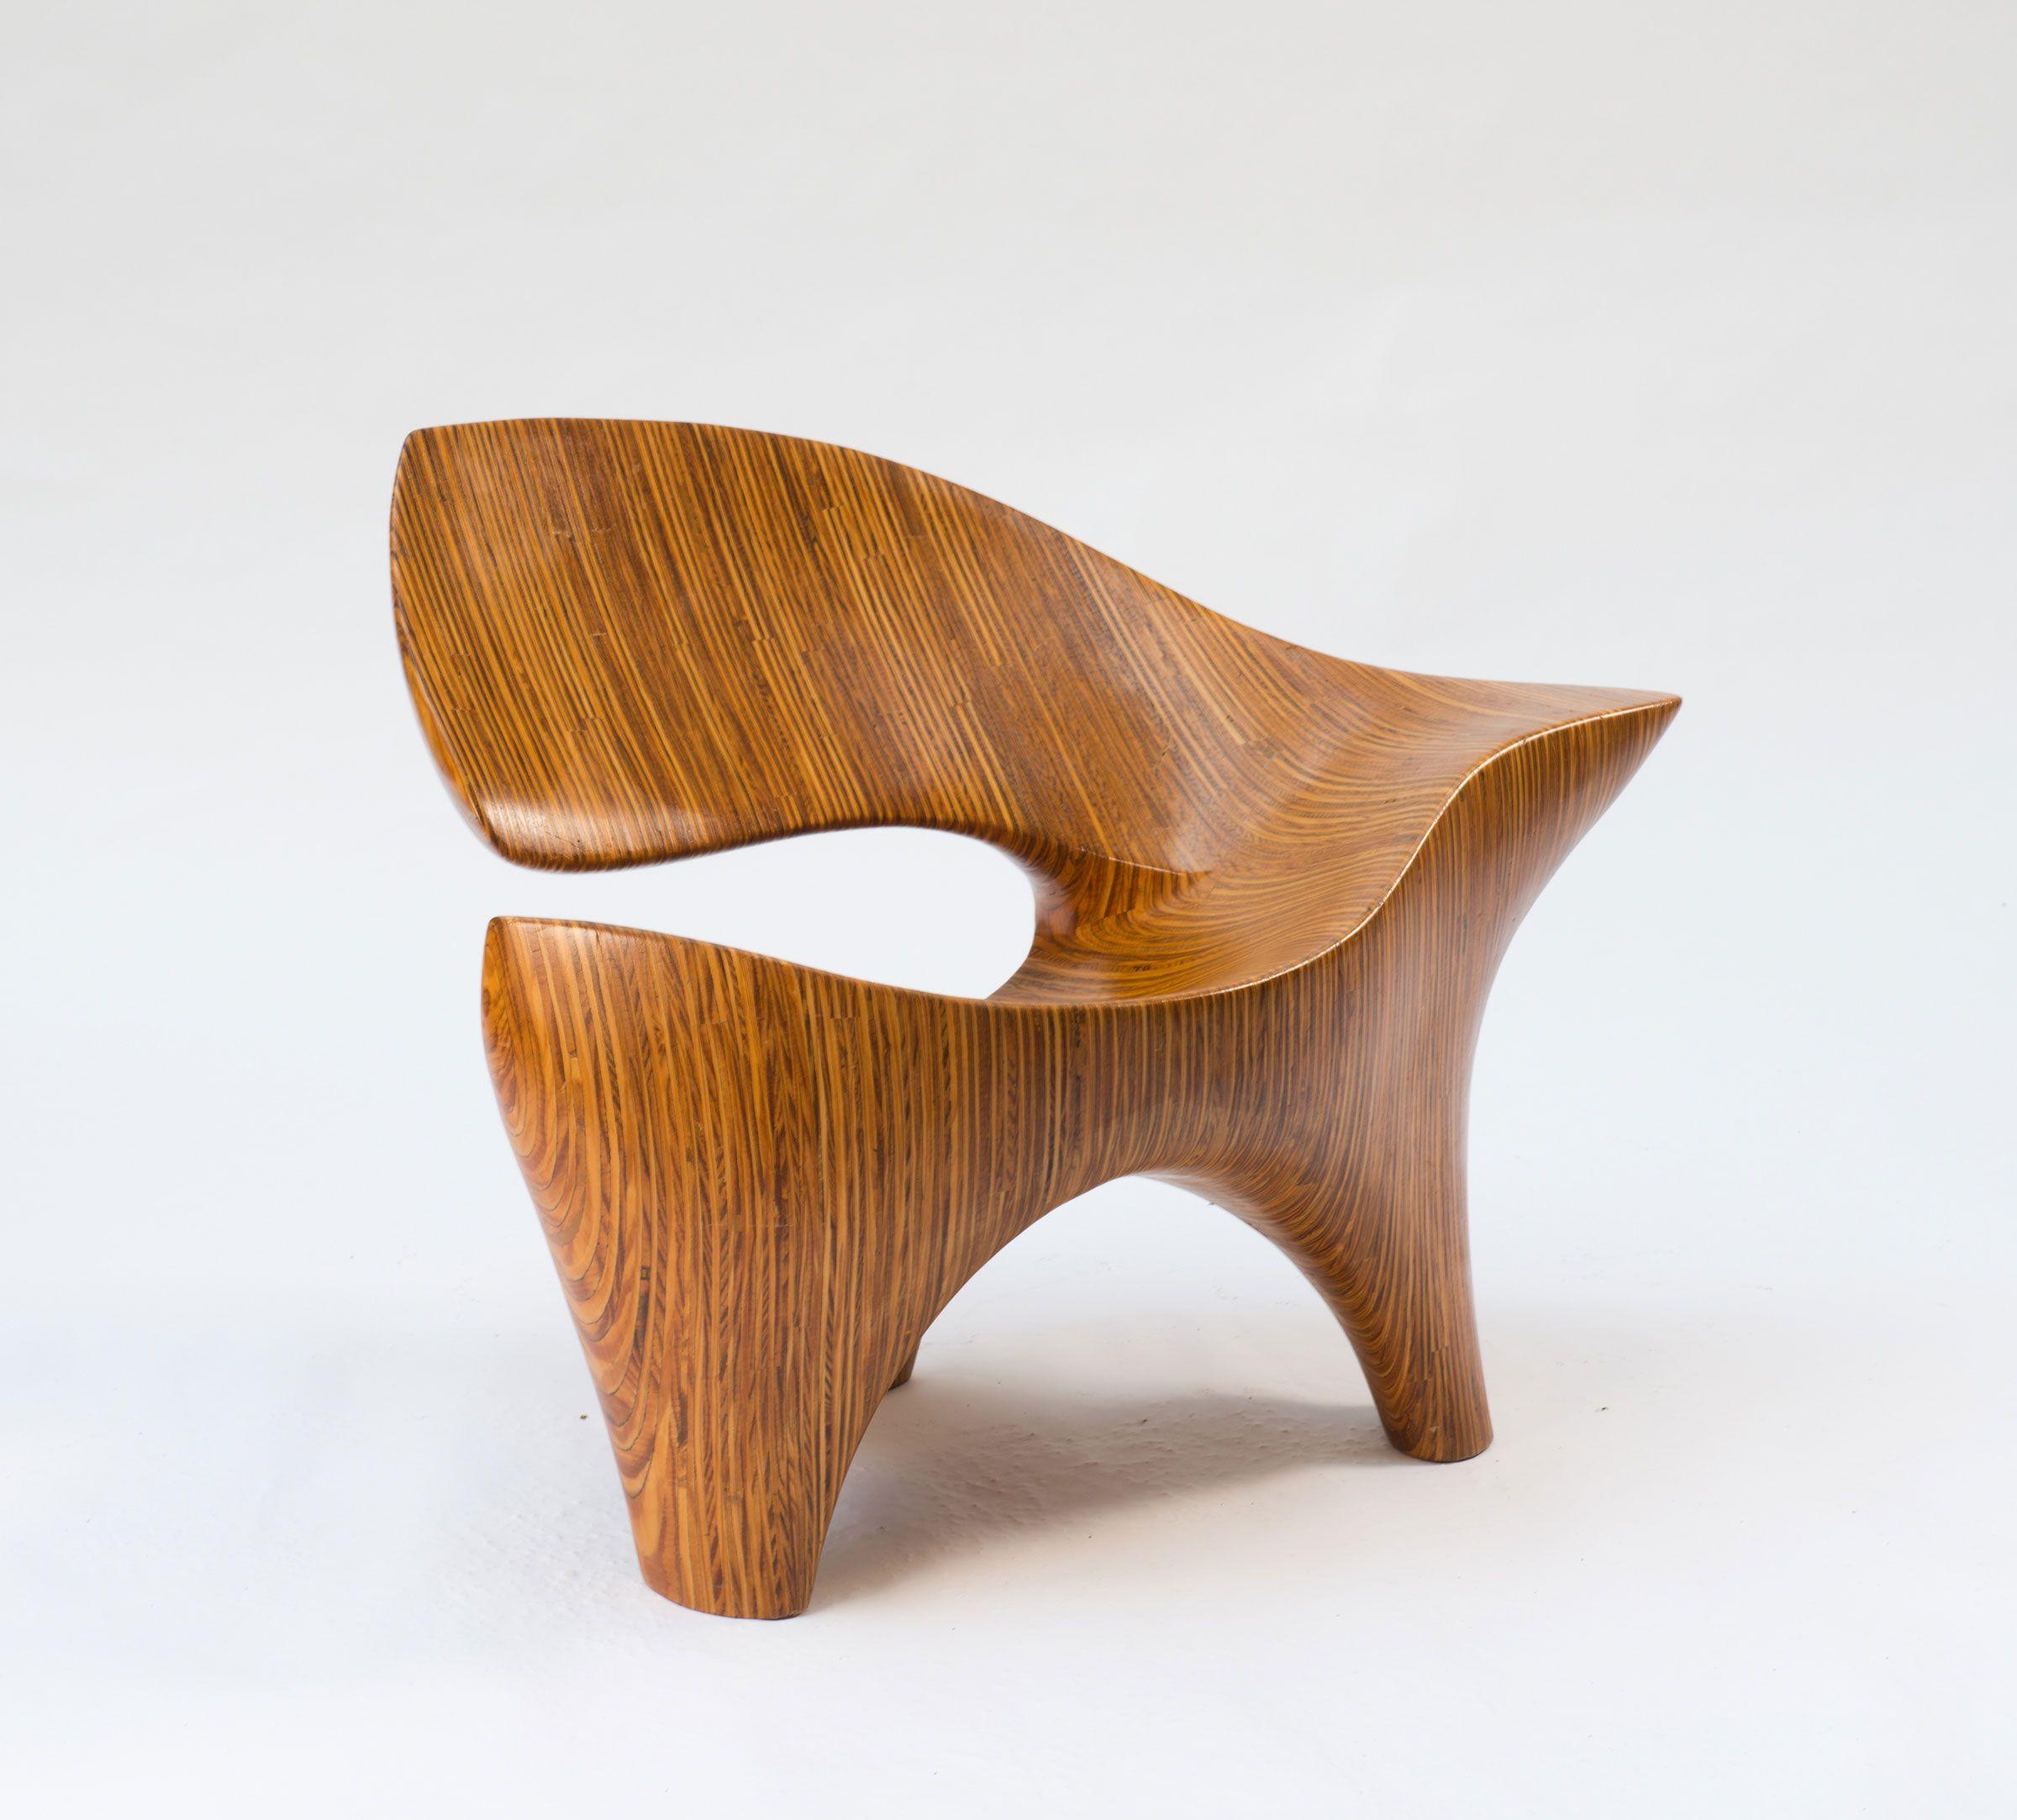 Irregular contoured shape posed of thin layers of plywood